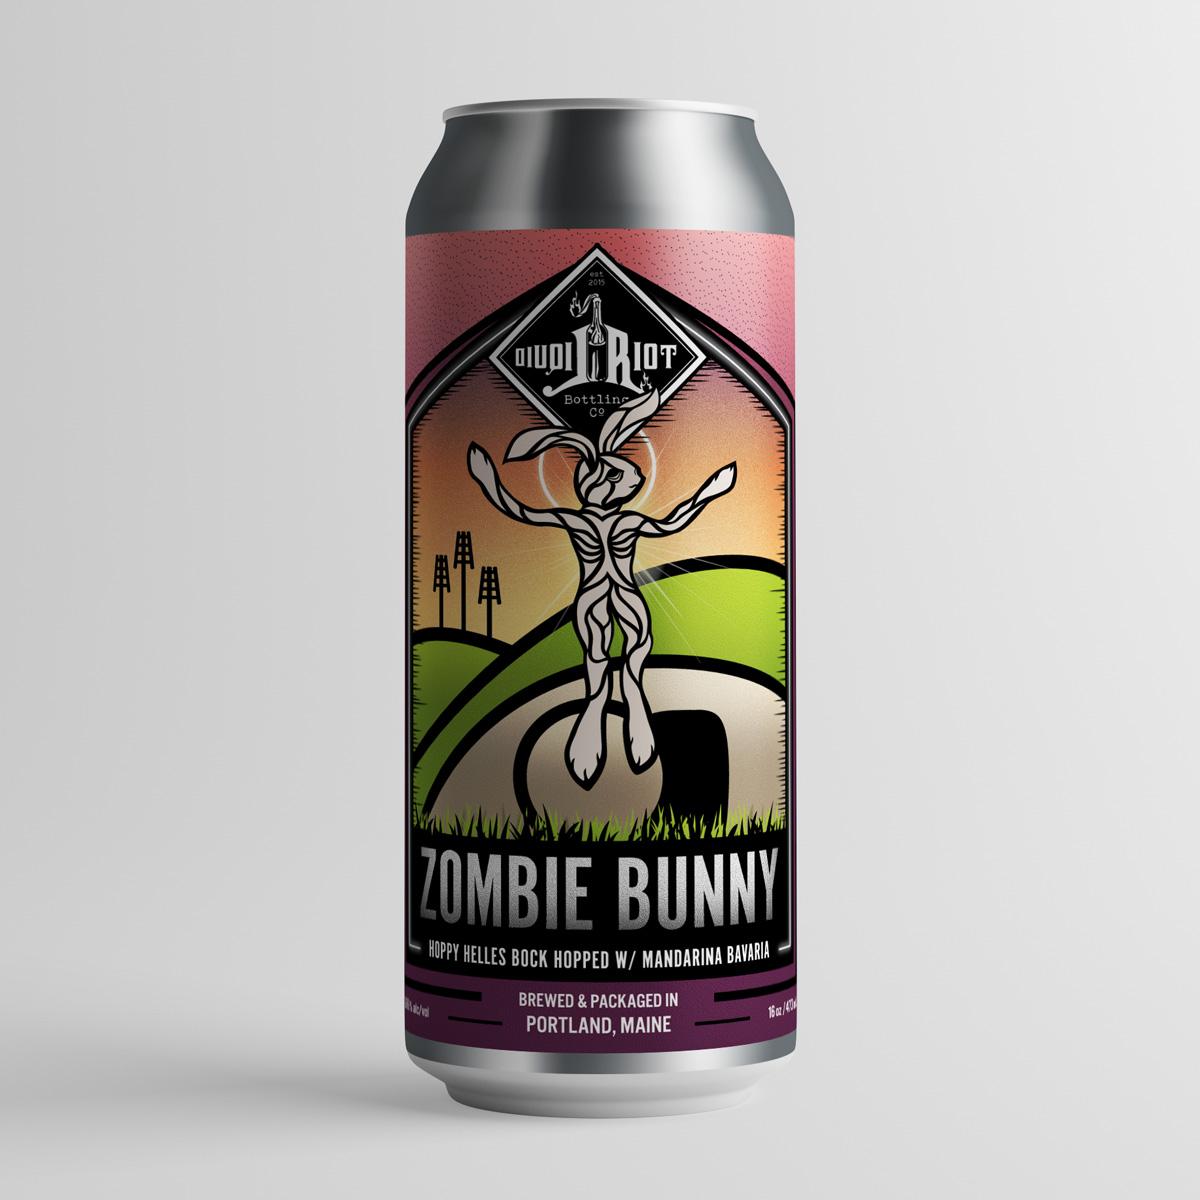 Liquid Riot Zombie Bunny